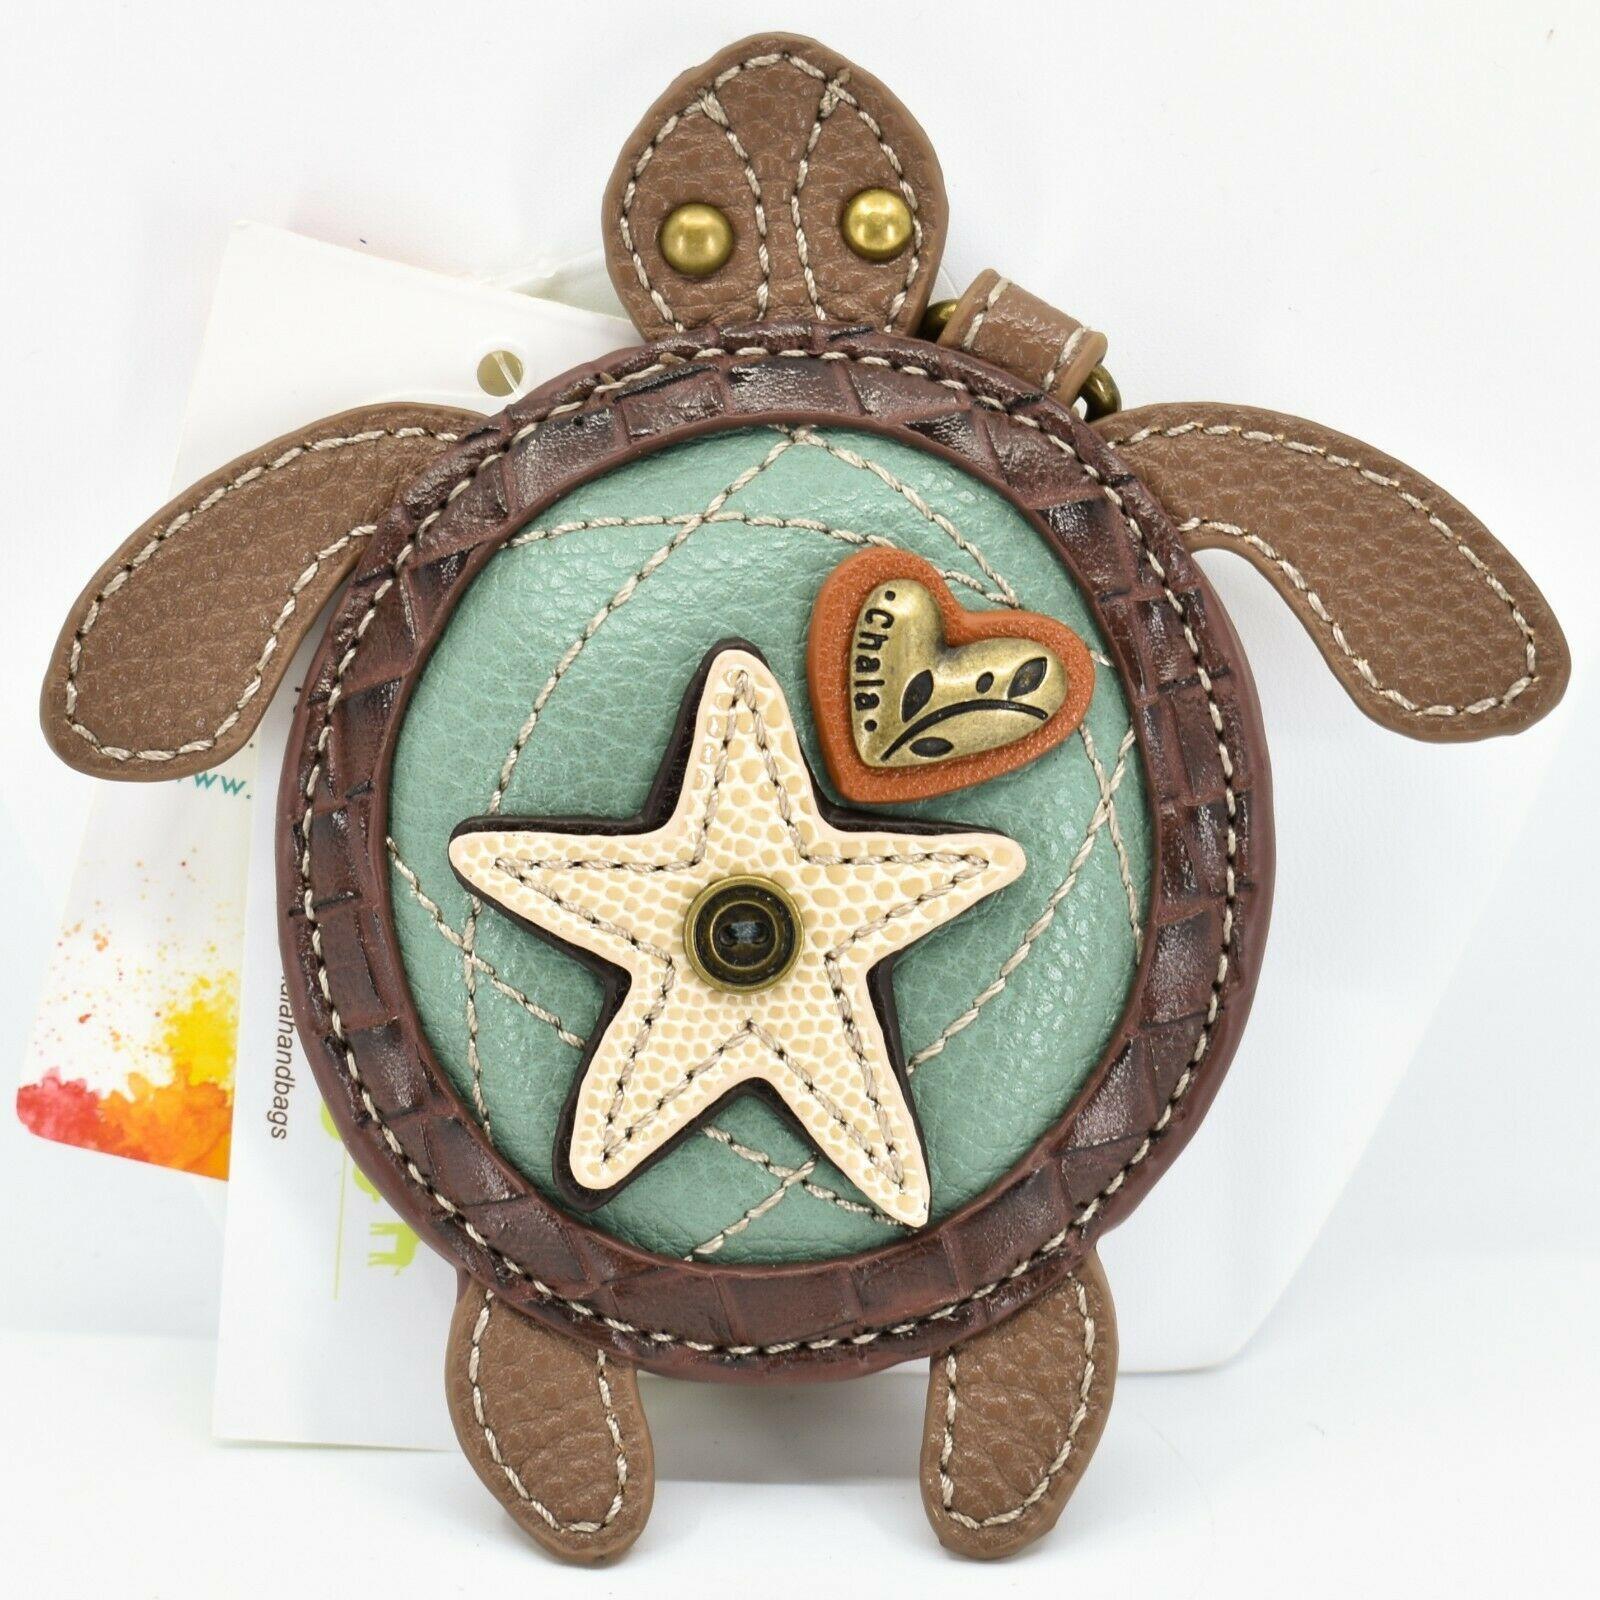 Chala Handbags Faux Leather Whimsical Sea Turtle Coin Purse Key Chain Keychain